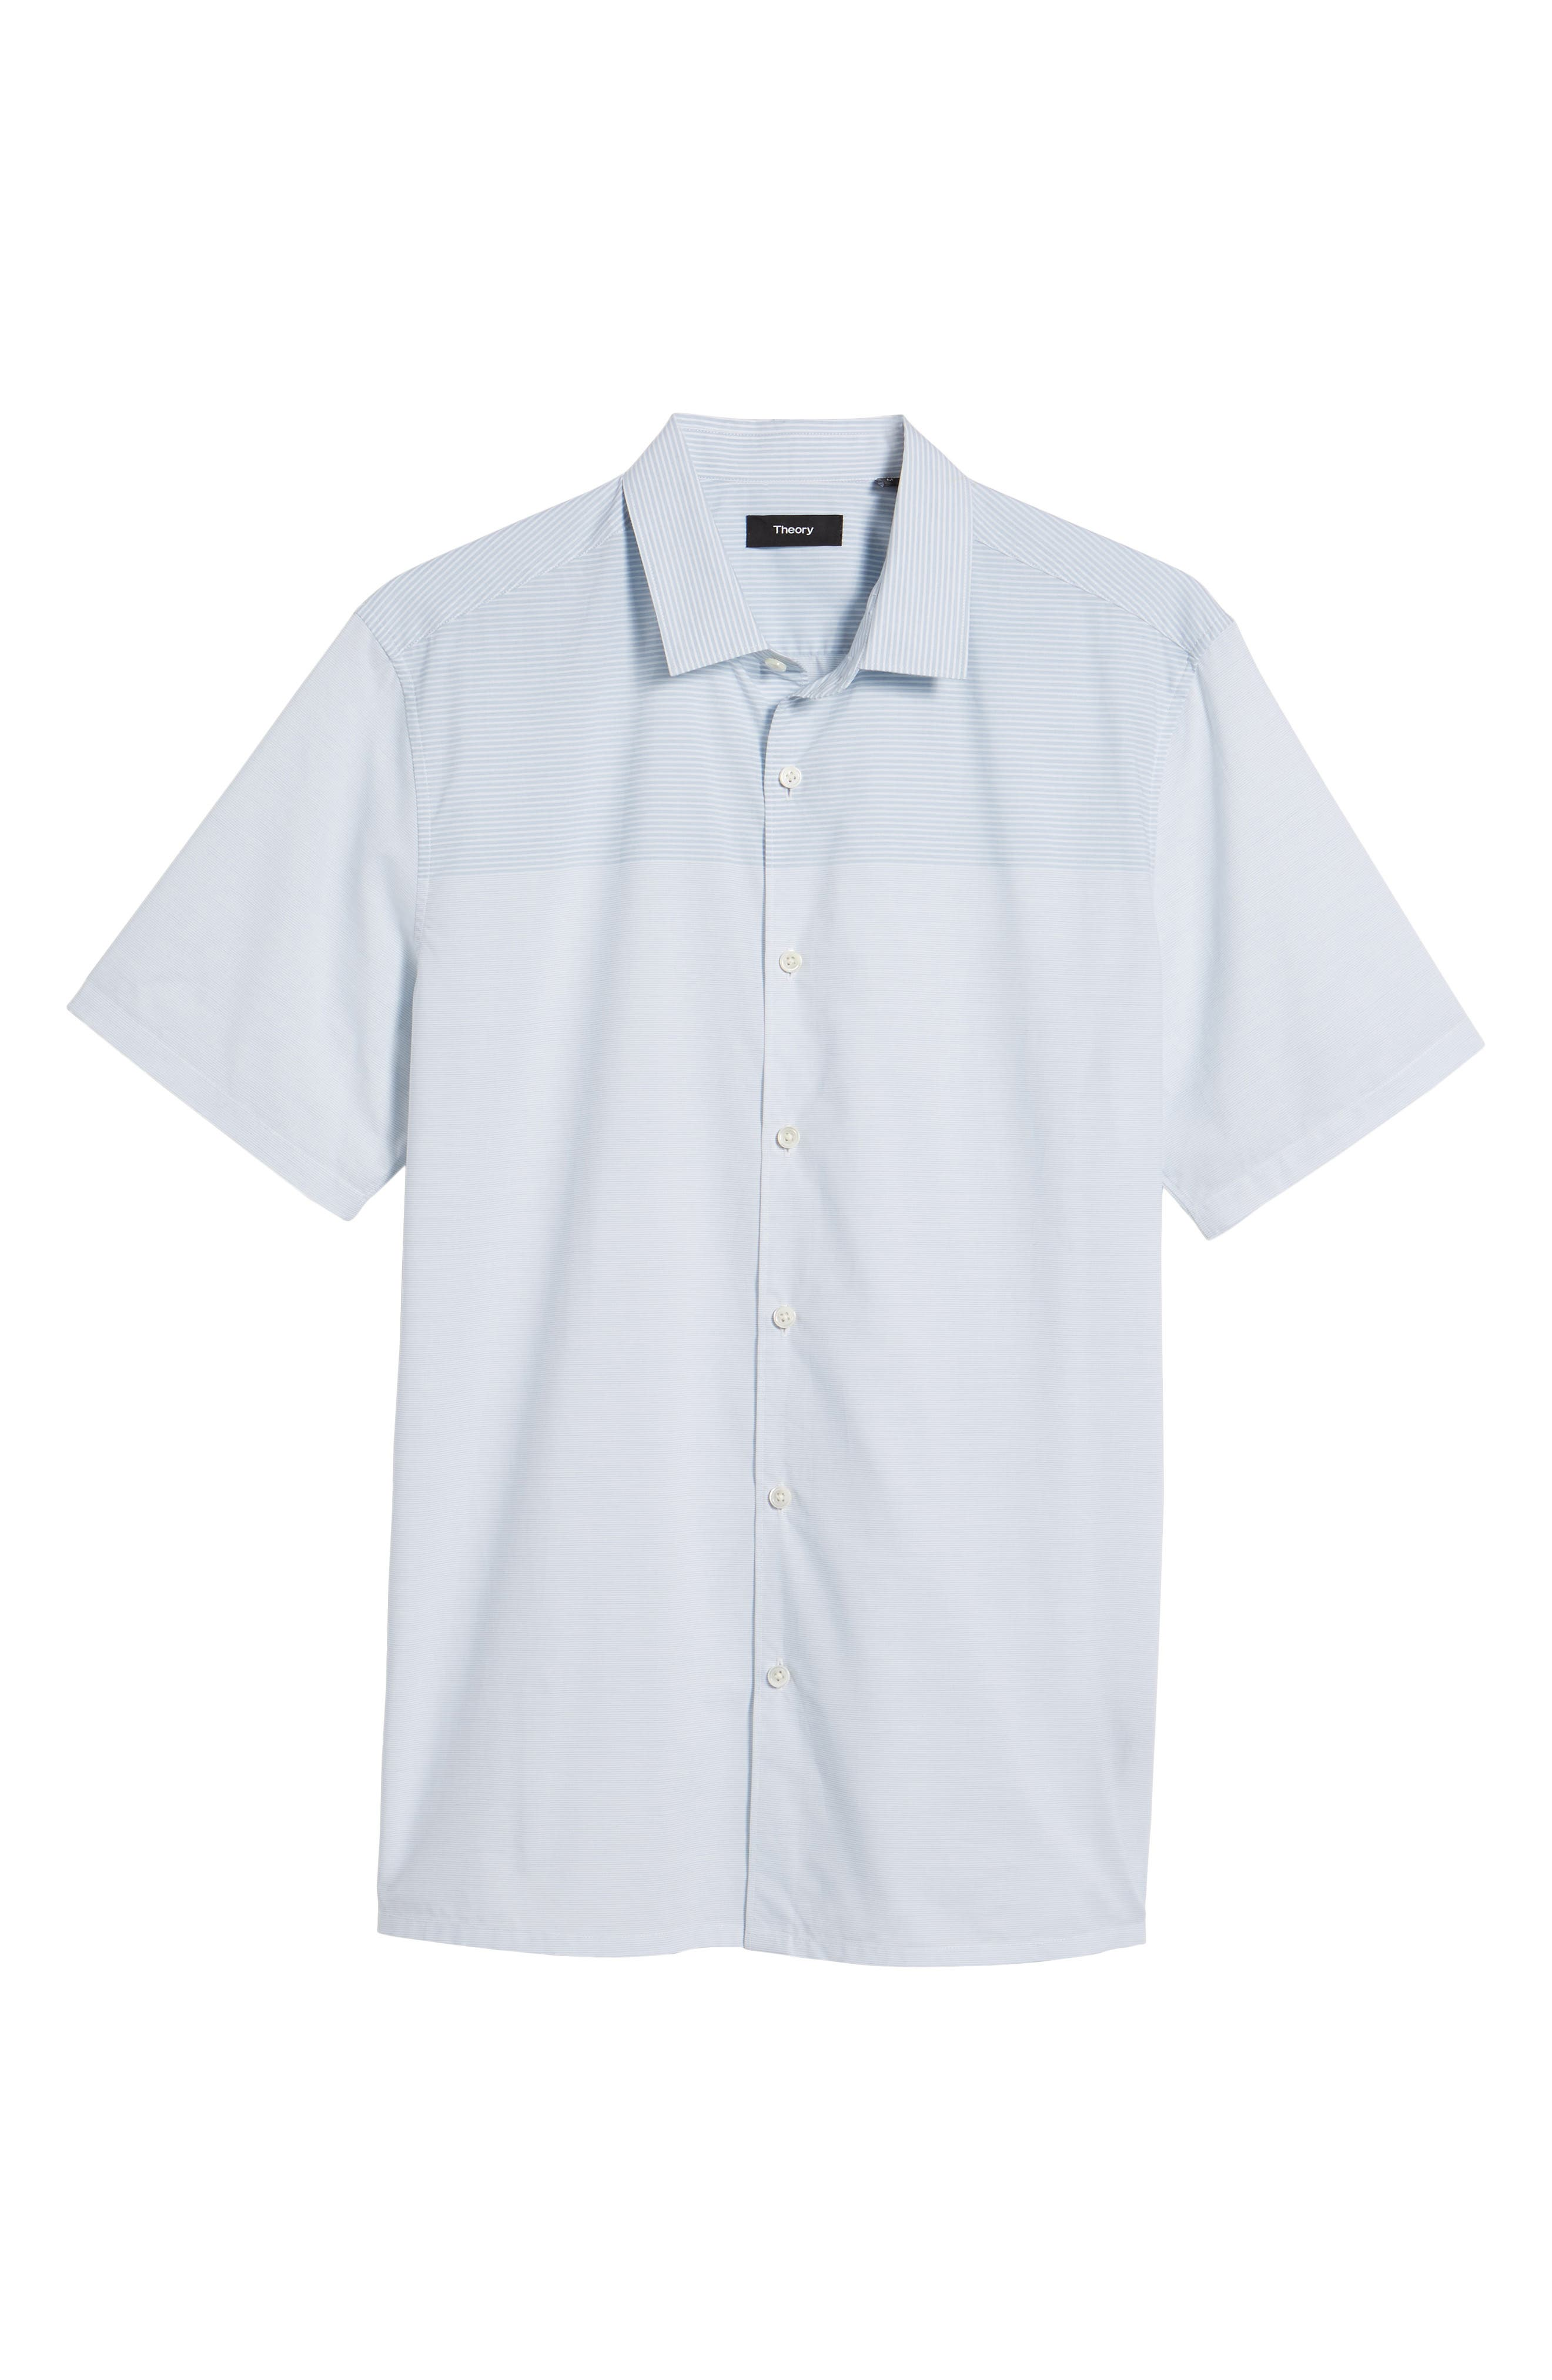 Murrary Regular Fit Stripe Short Sleeve Sport Shirt,                             Alternate thumbnail 6, color,                             Breeze Multi